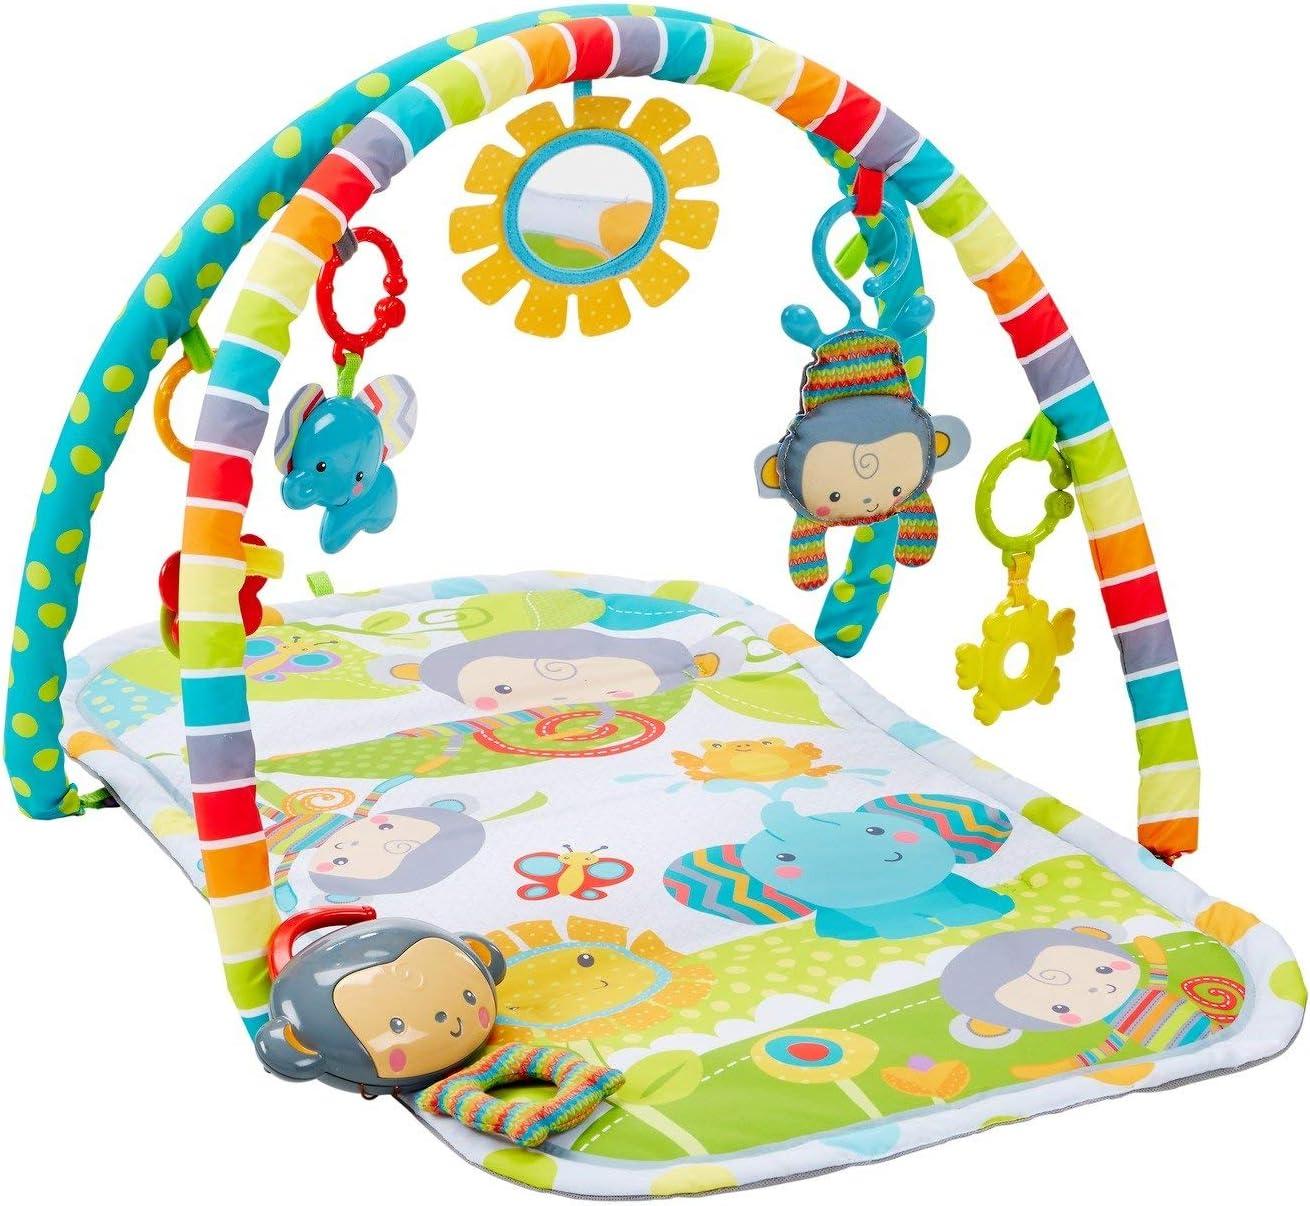 Fisher-Price Gimnasio Musical Monitos Divertidos, manta de juego para bebé (Mattel CLJ42)